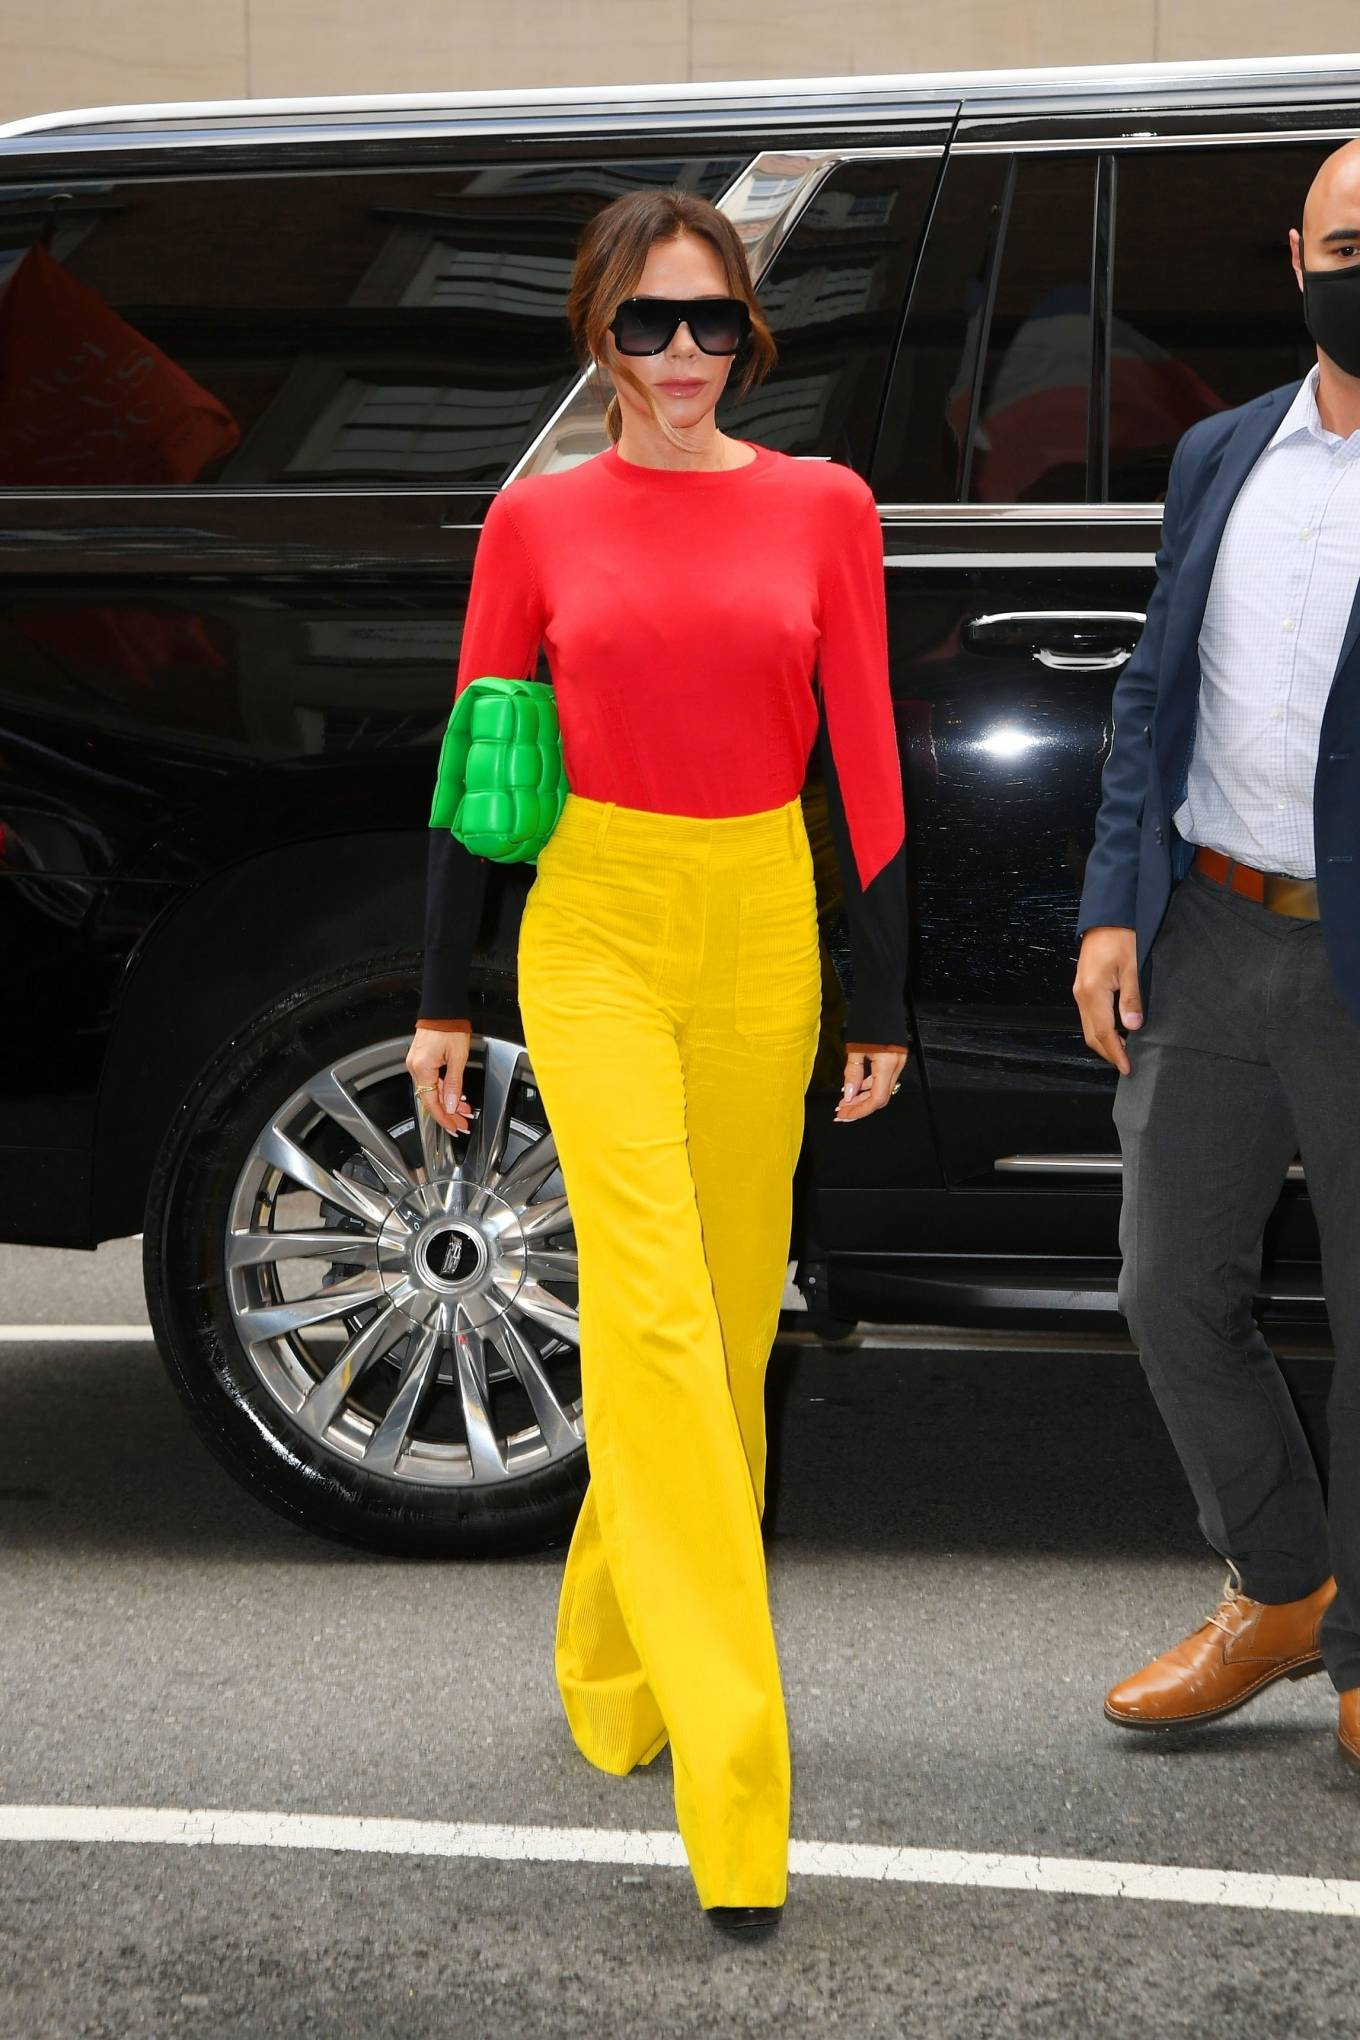 Victoria Beckham 2021 : Victoria Beckham – on Good Morning America promoting her new designer clothing in New York City-24